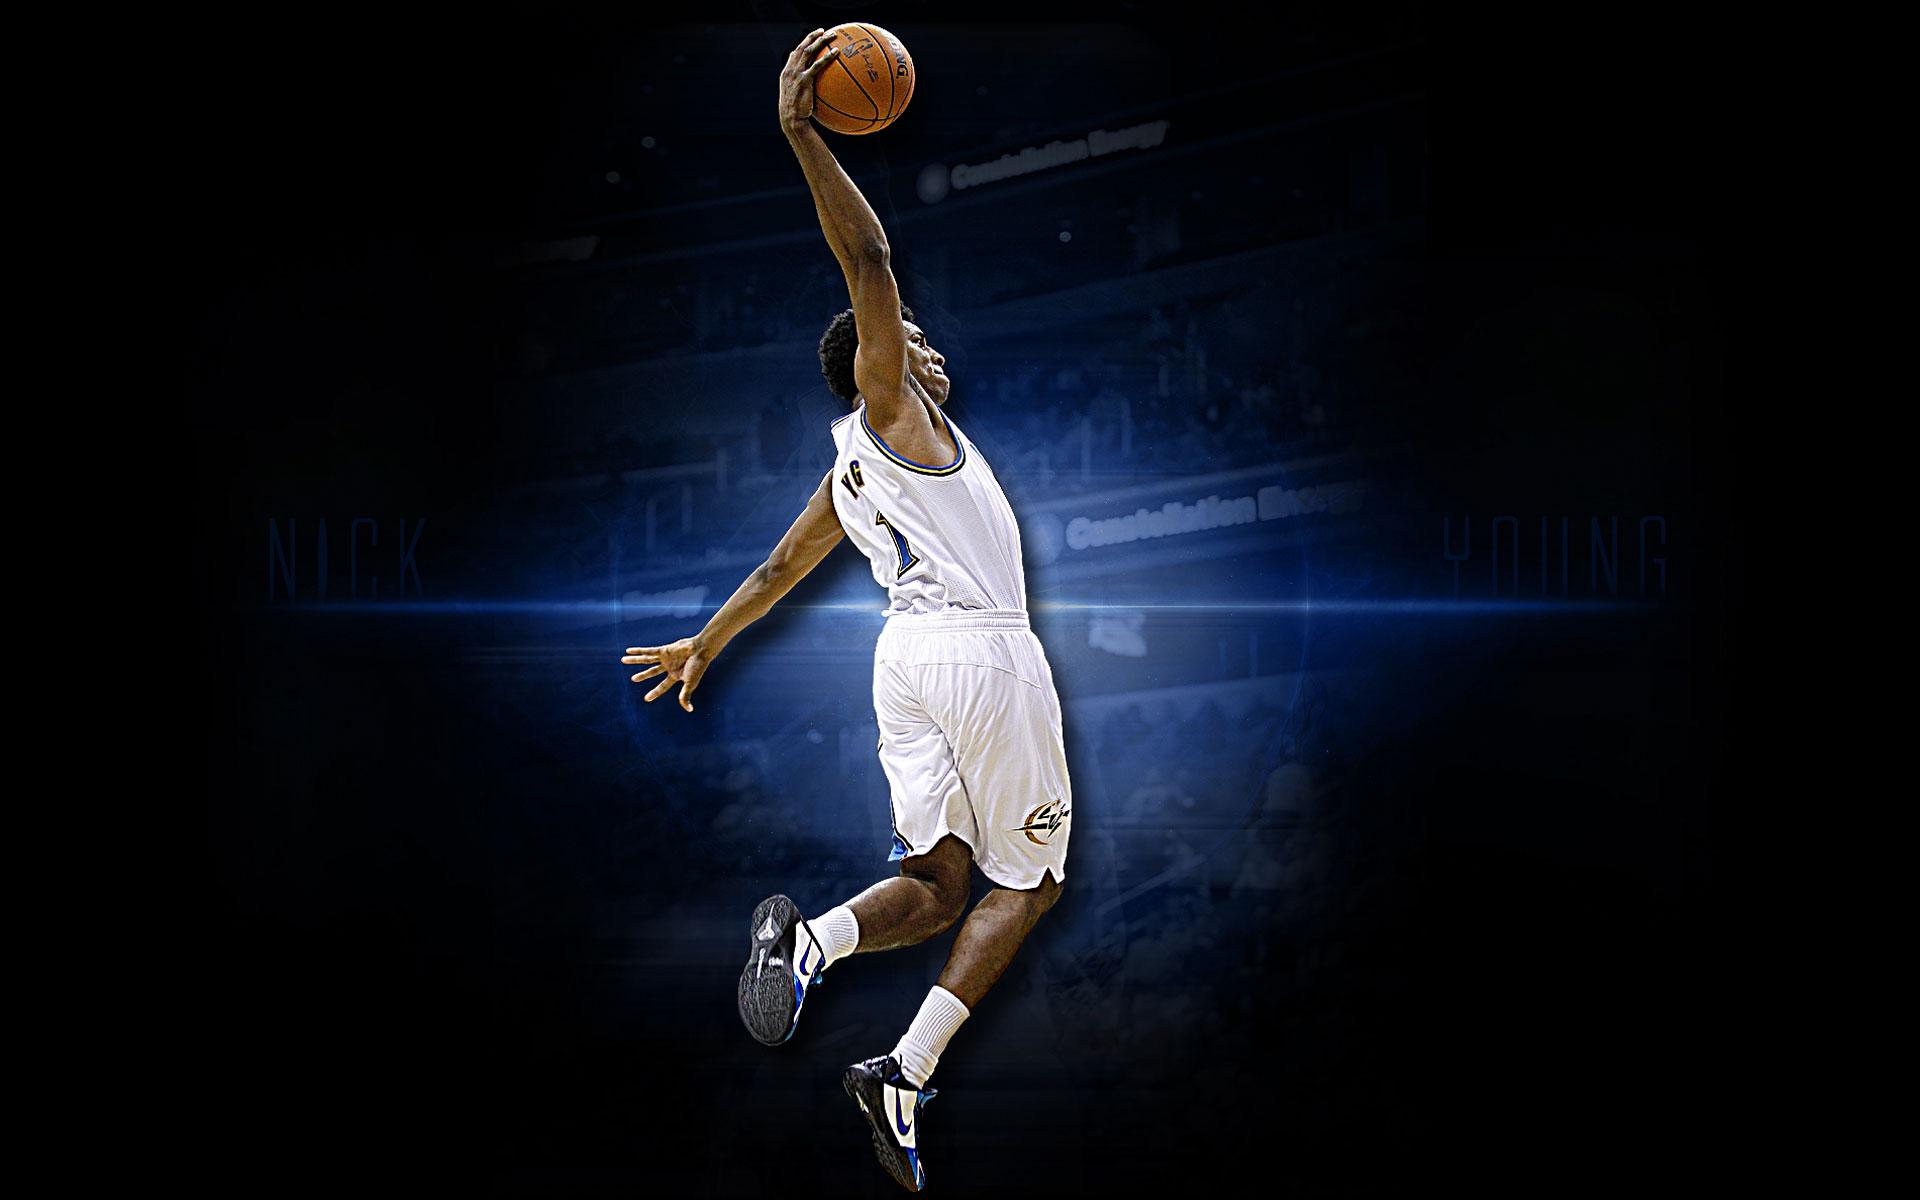 Awesome Basketball Wallpapers Hd Pixelstalk Best Ideas About Wallpaper Basketball On Pinterest Basketball 1920x1200